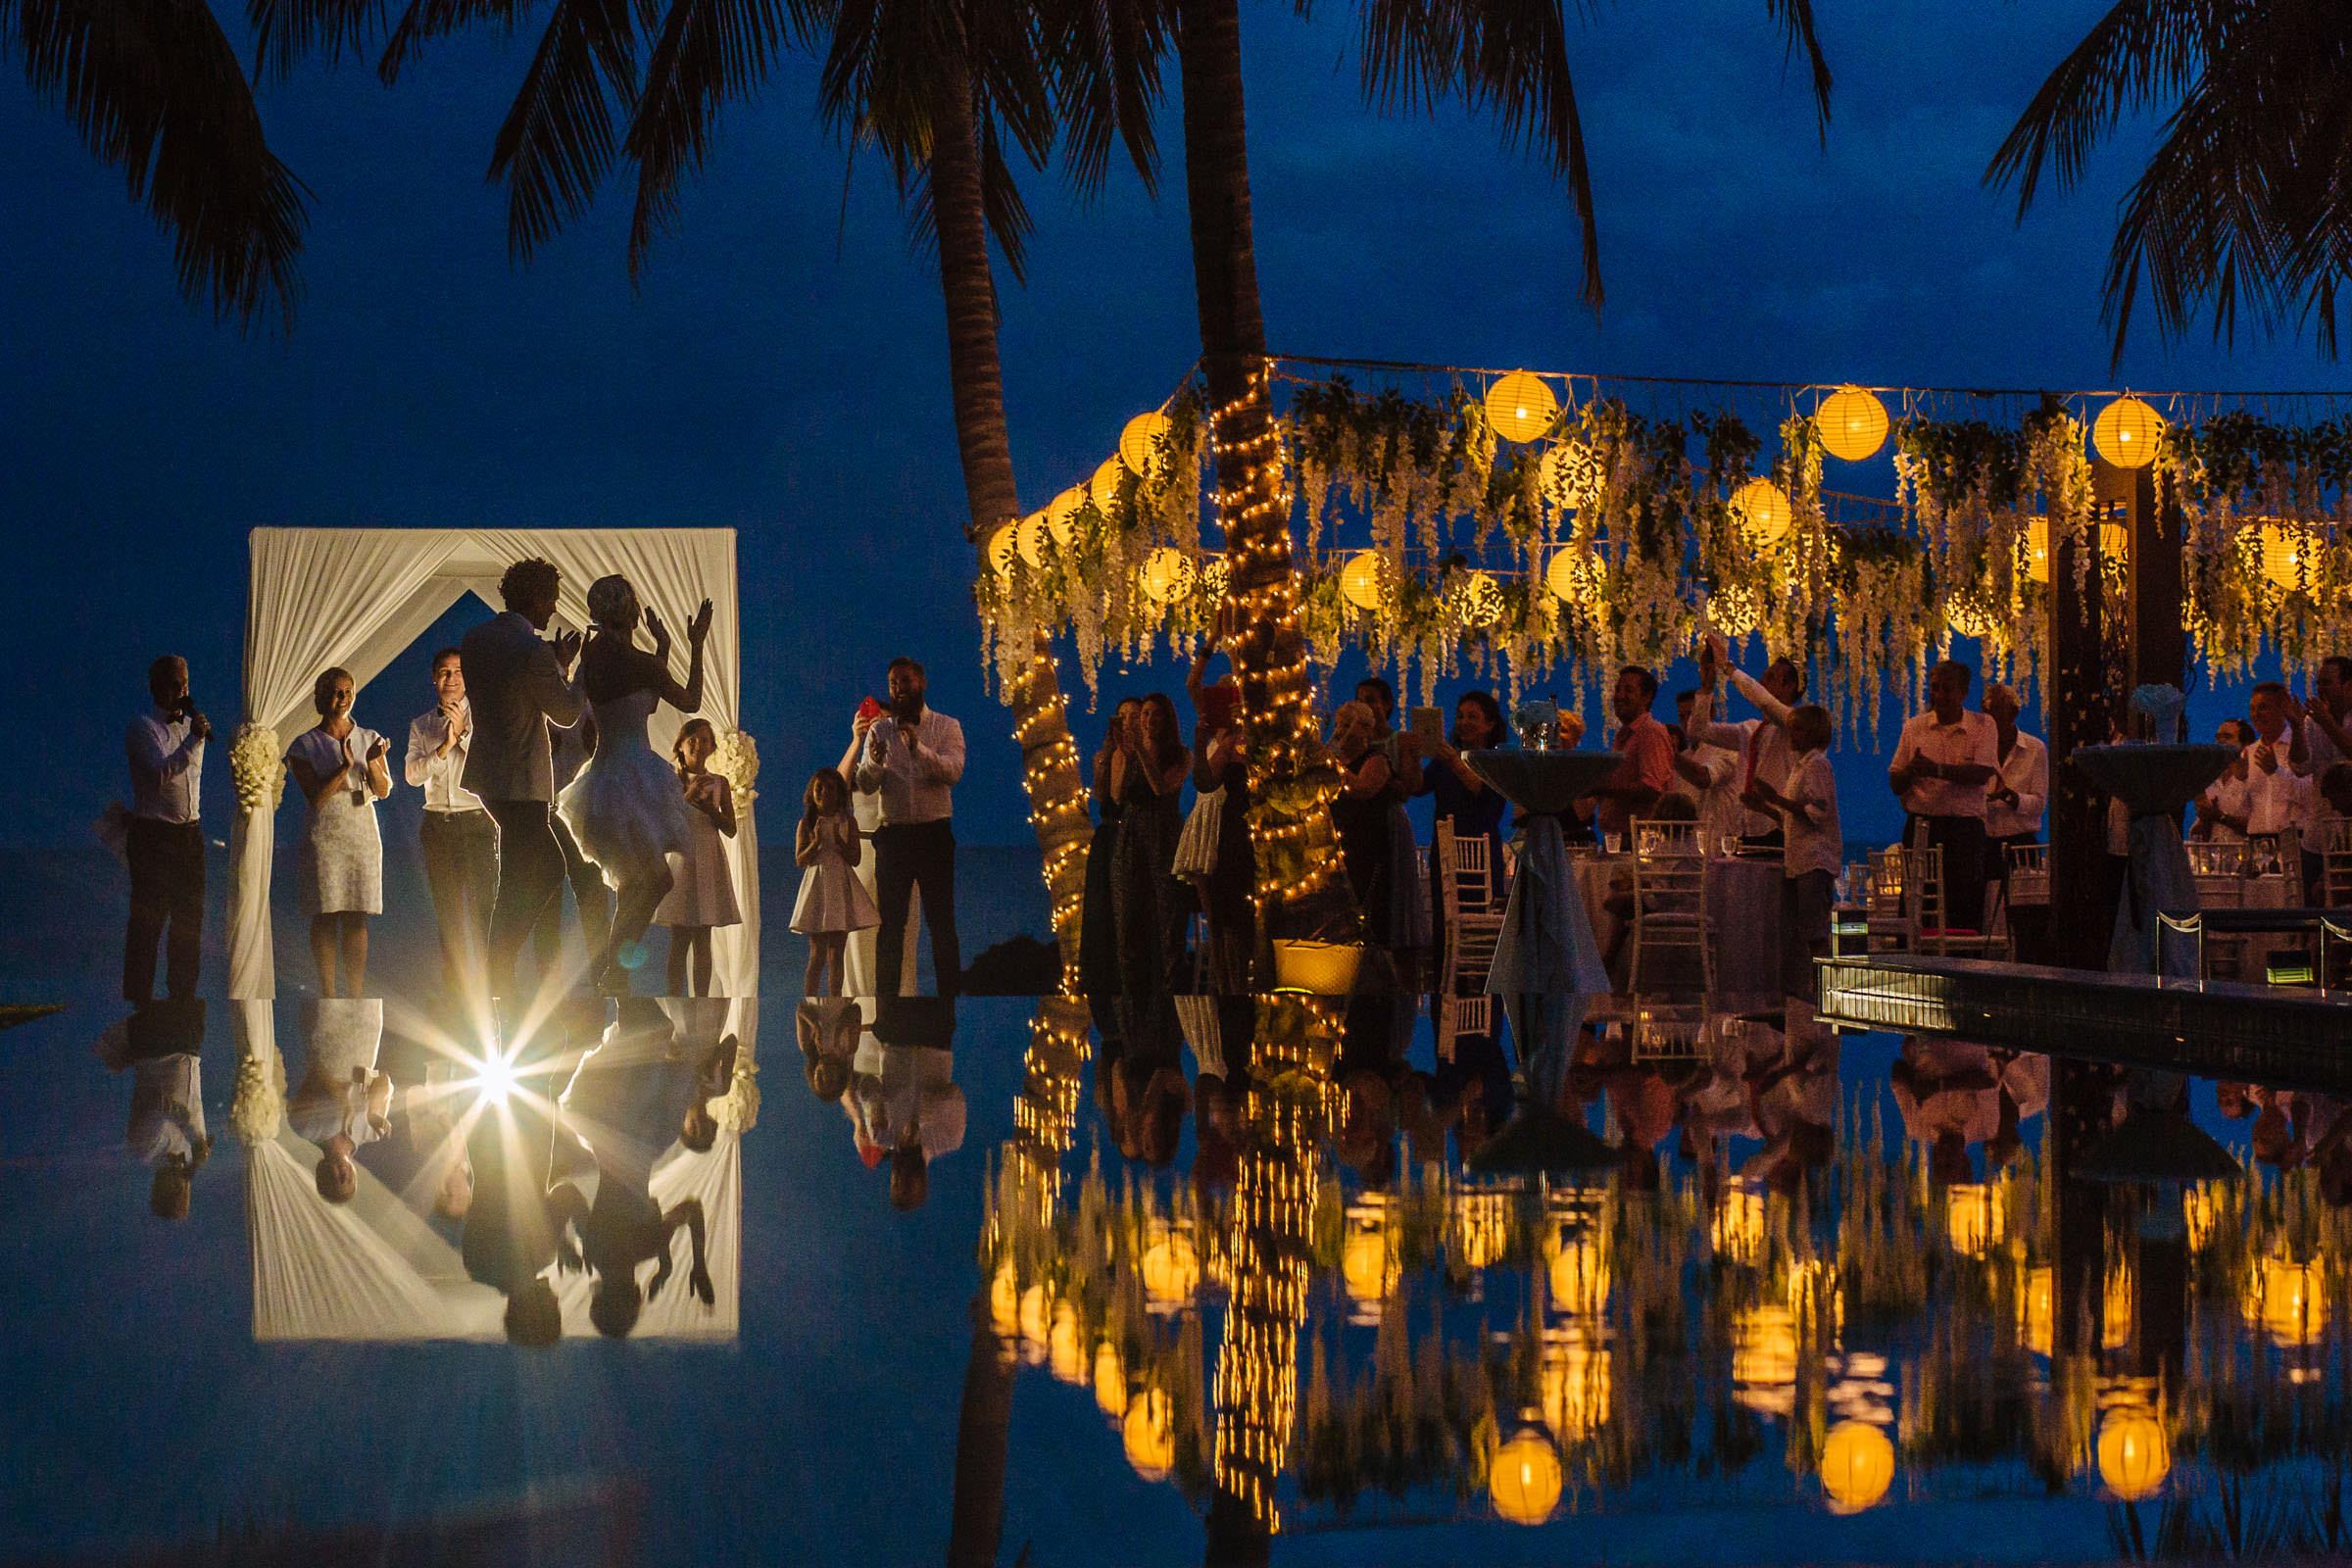 tropical reception by lantern light - Photo by Wainwright Weddings